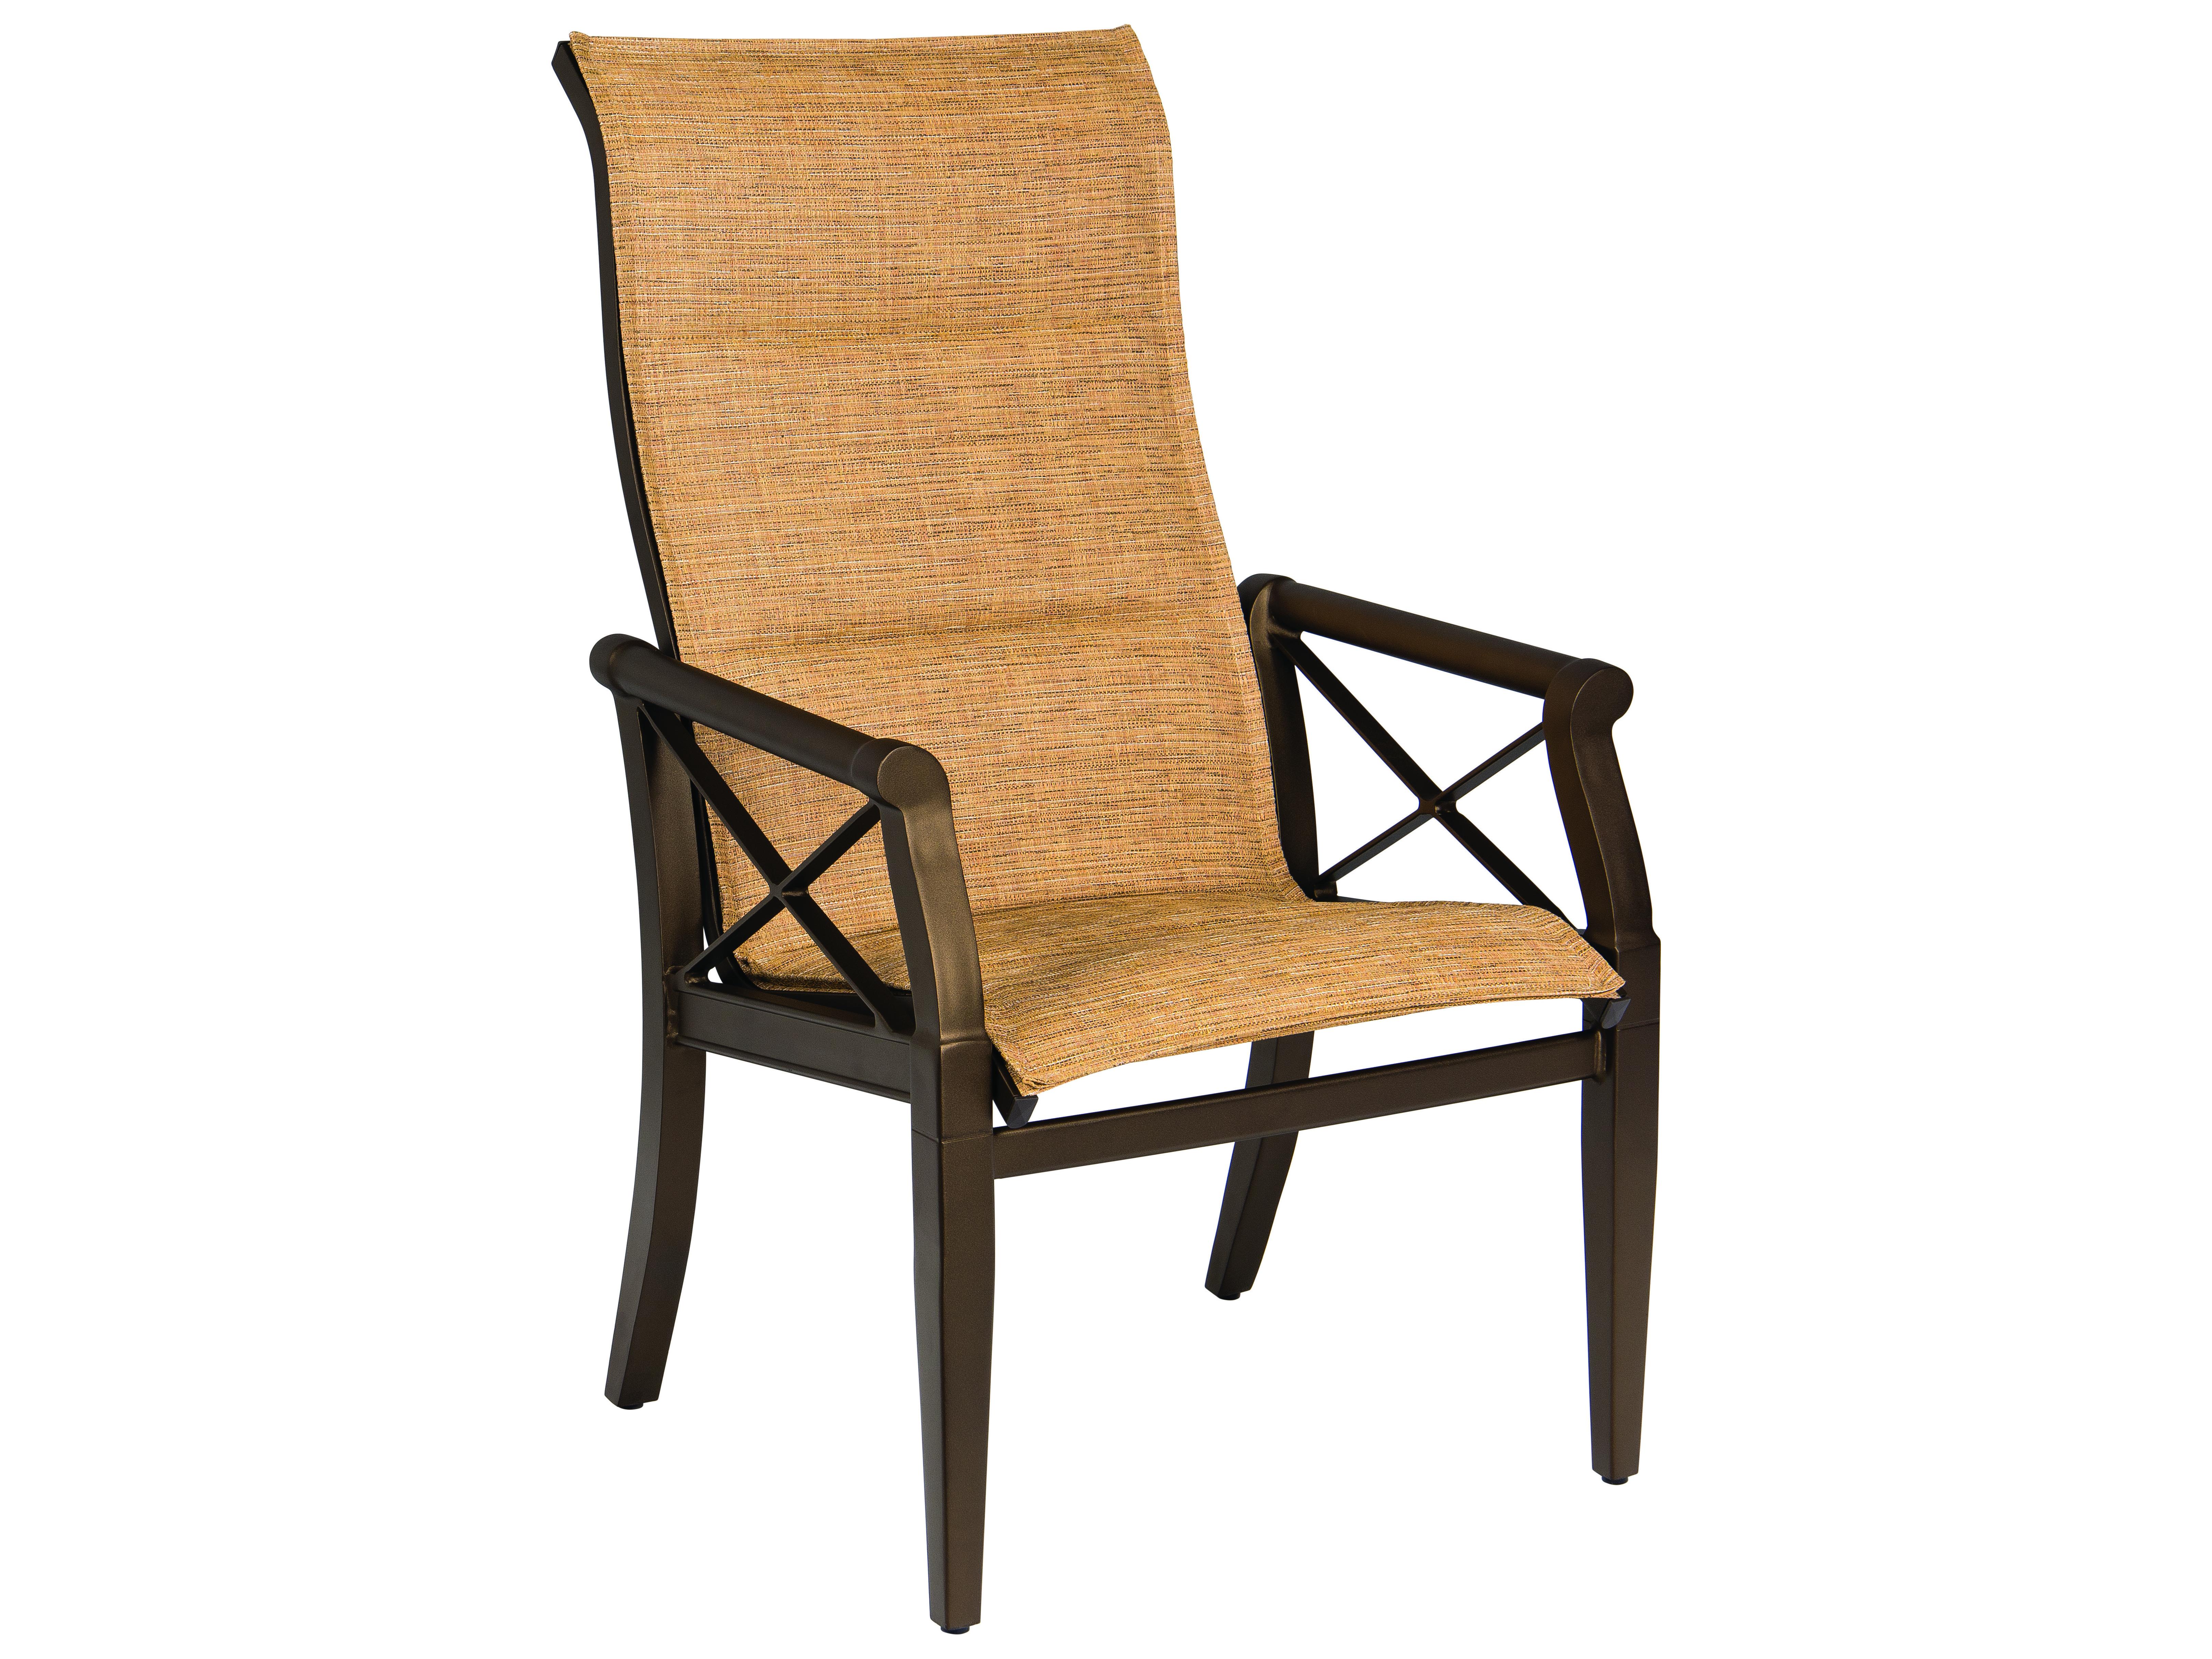 woodard andover padded sling high back dining chair wr3q0525. Black Bedroom Furniture Sets. Home Design Ideas